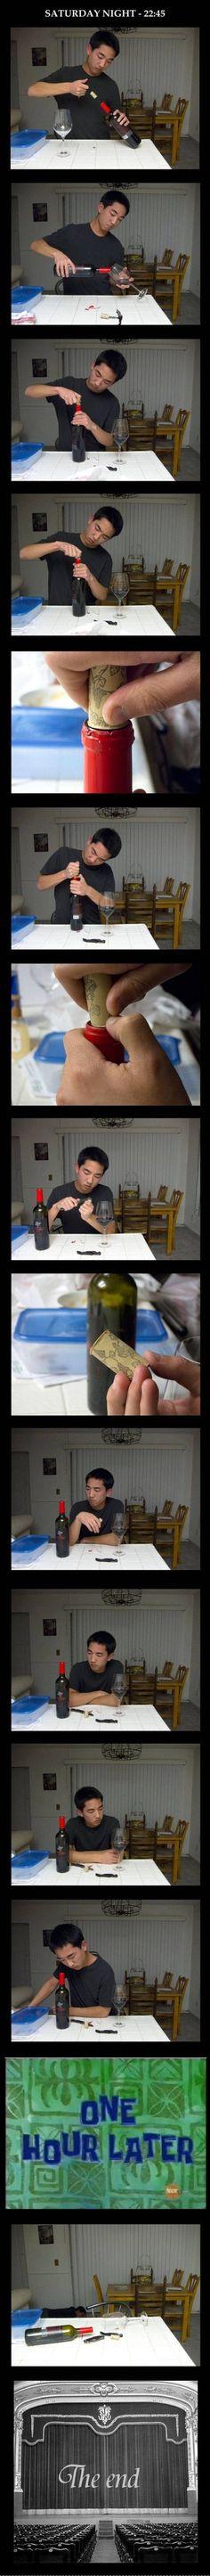 Wine Problems